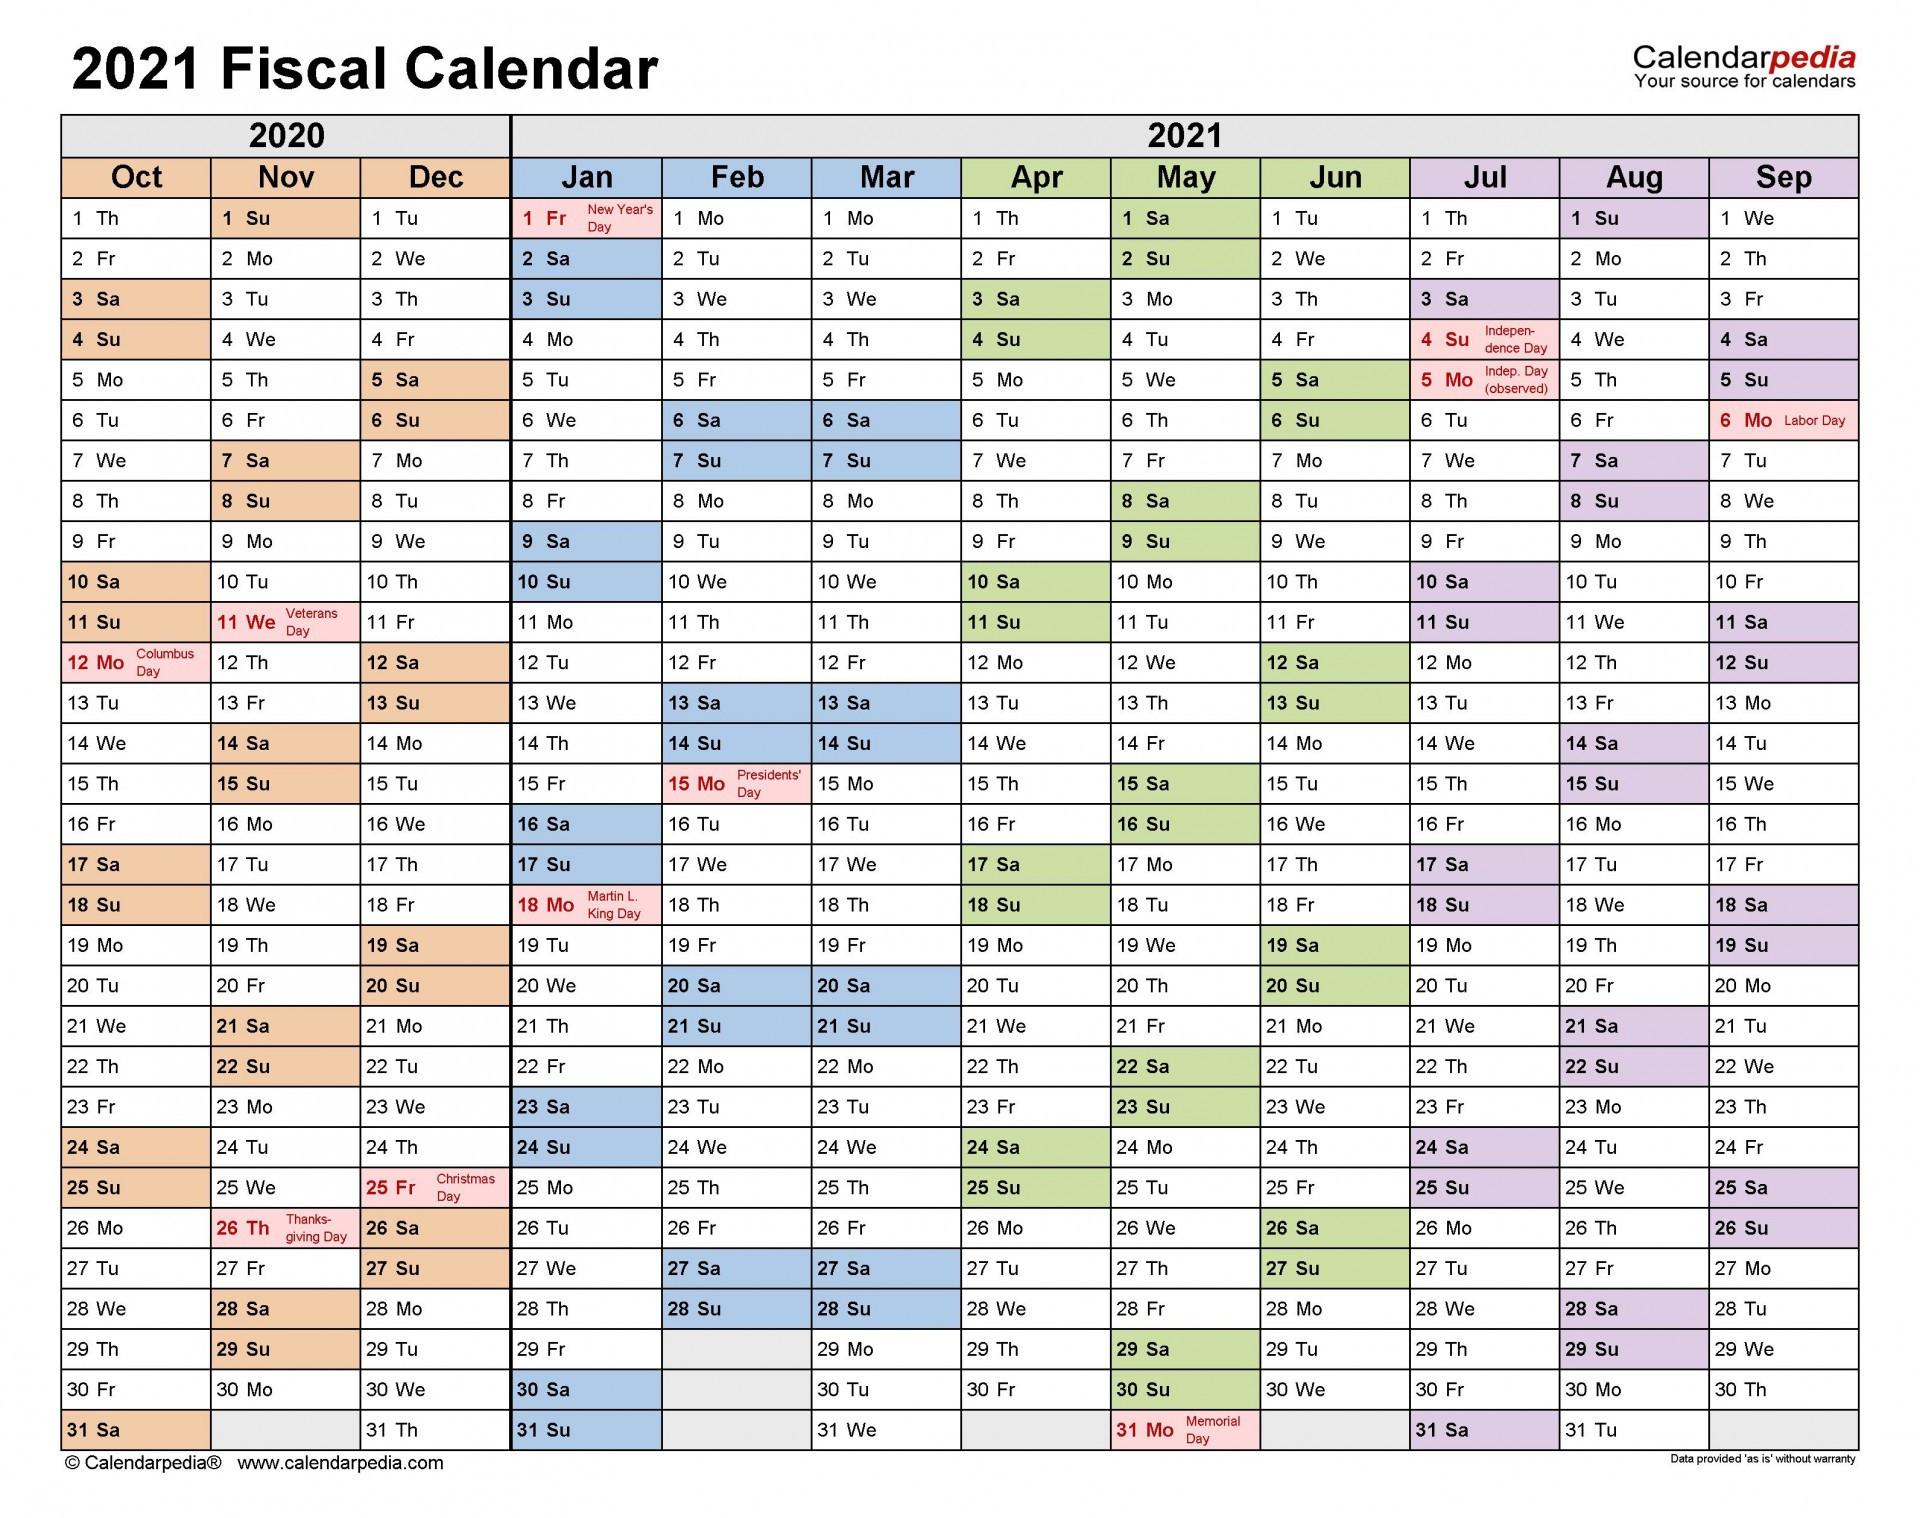 Excel Calendar 2021 Template ~ Addictionary-Excel Calendar Template 2021